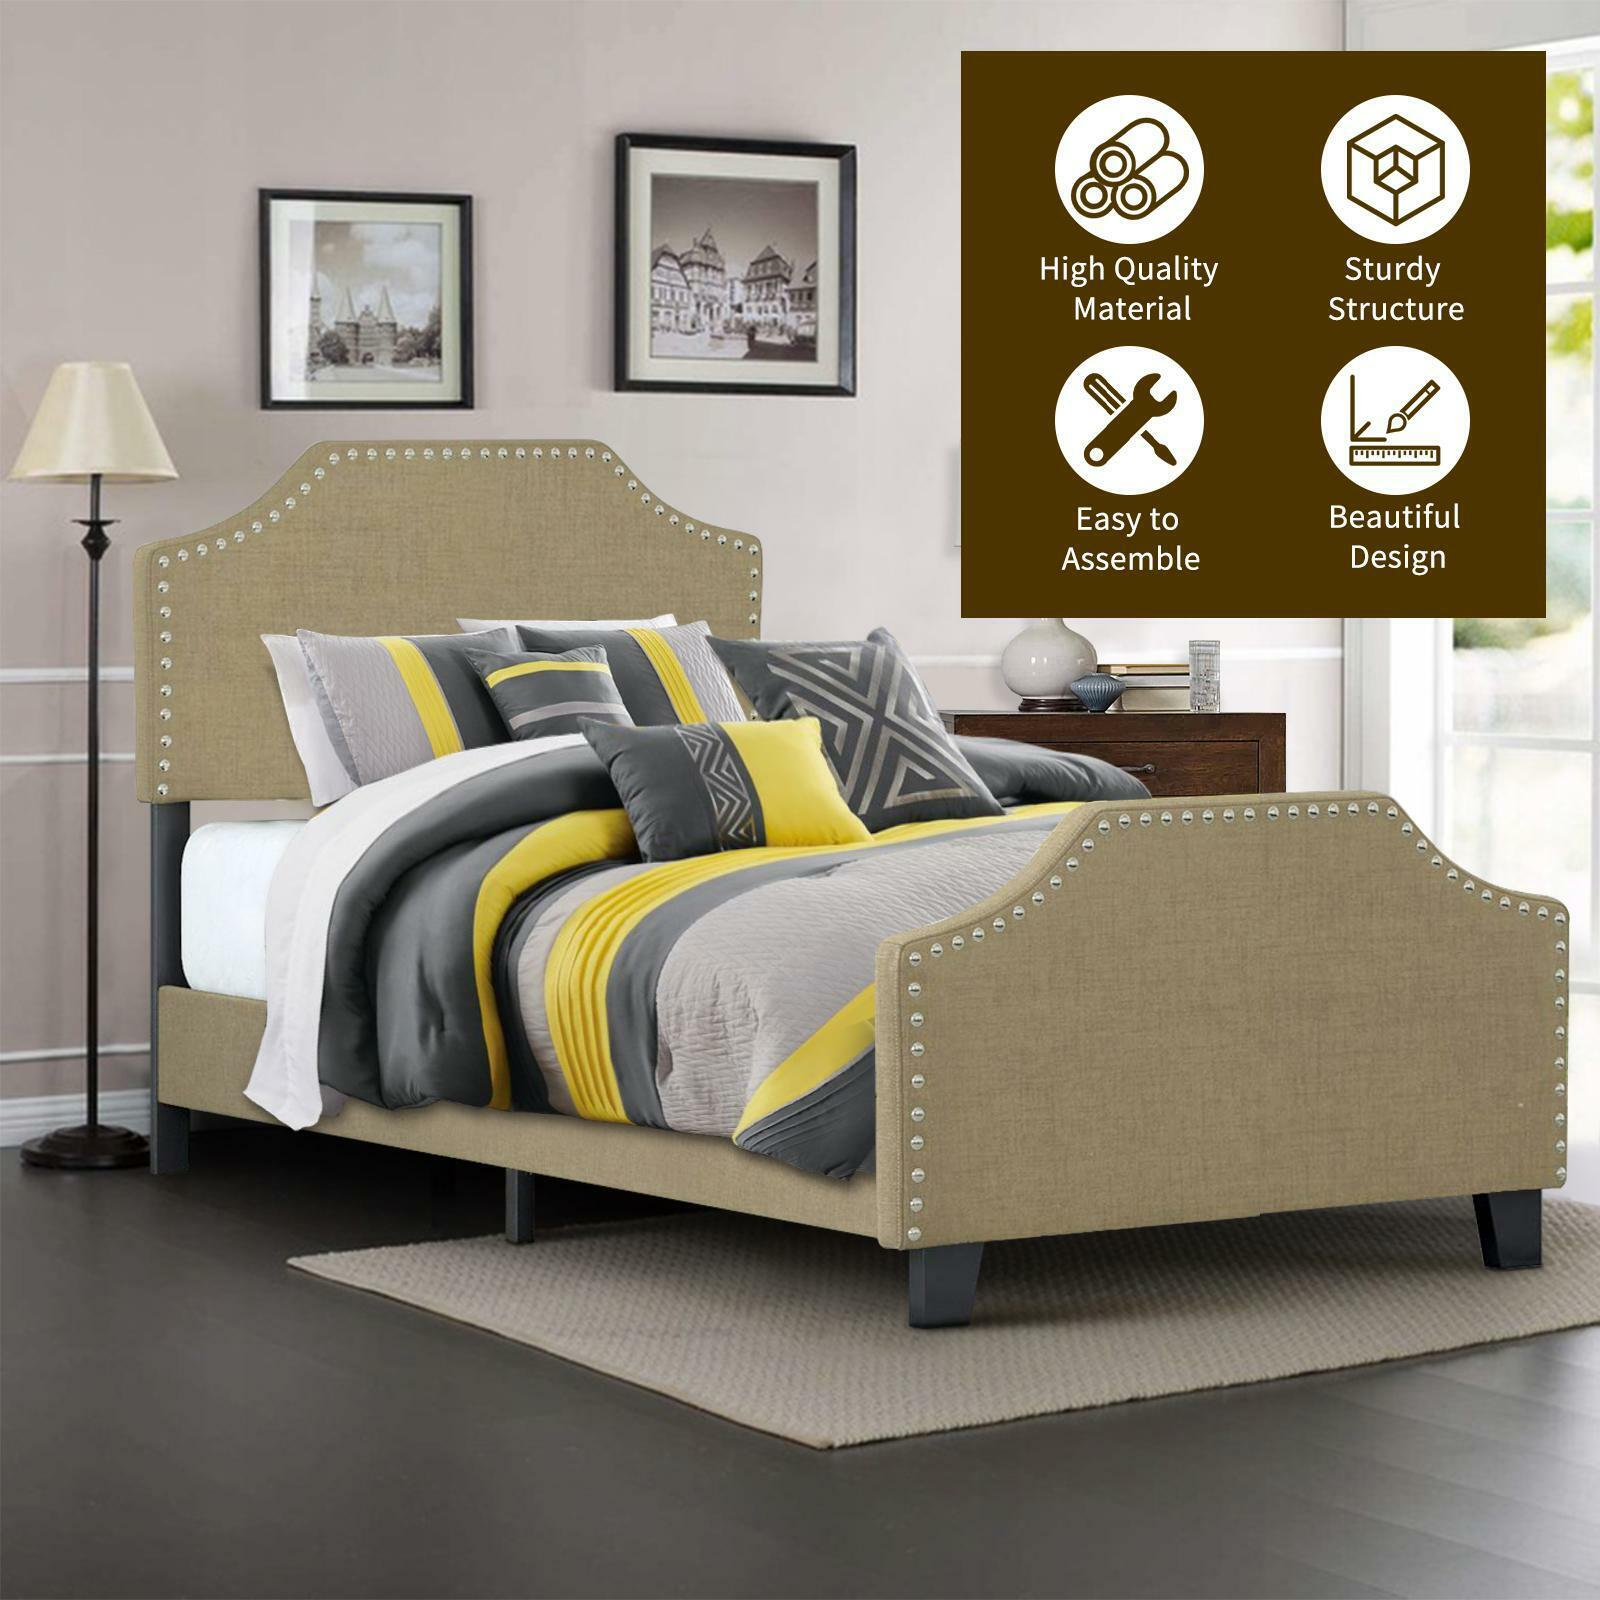 Twin/Full/Queen Size Platform Bed Frame Upholstered Linen He